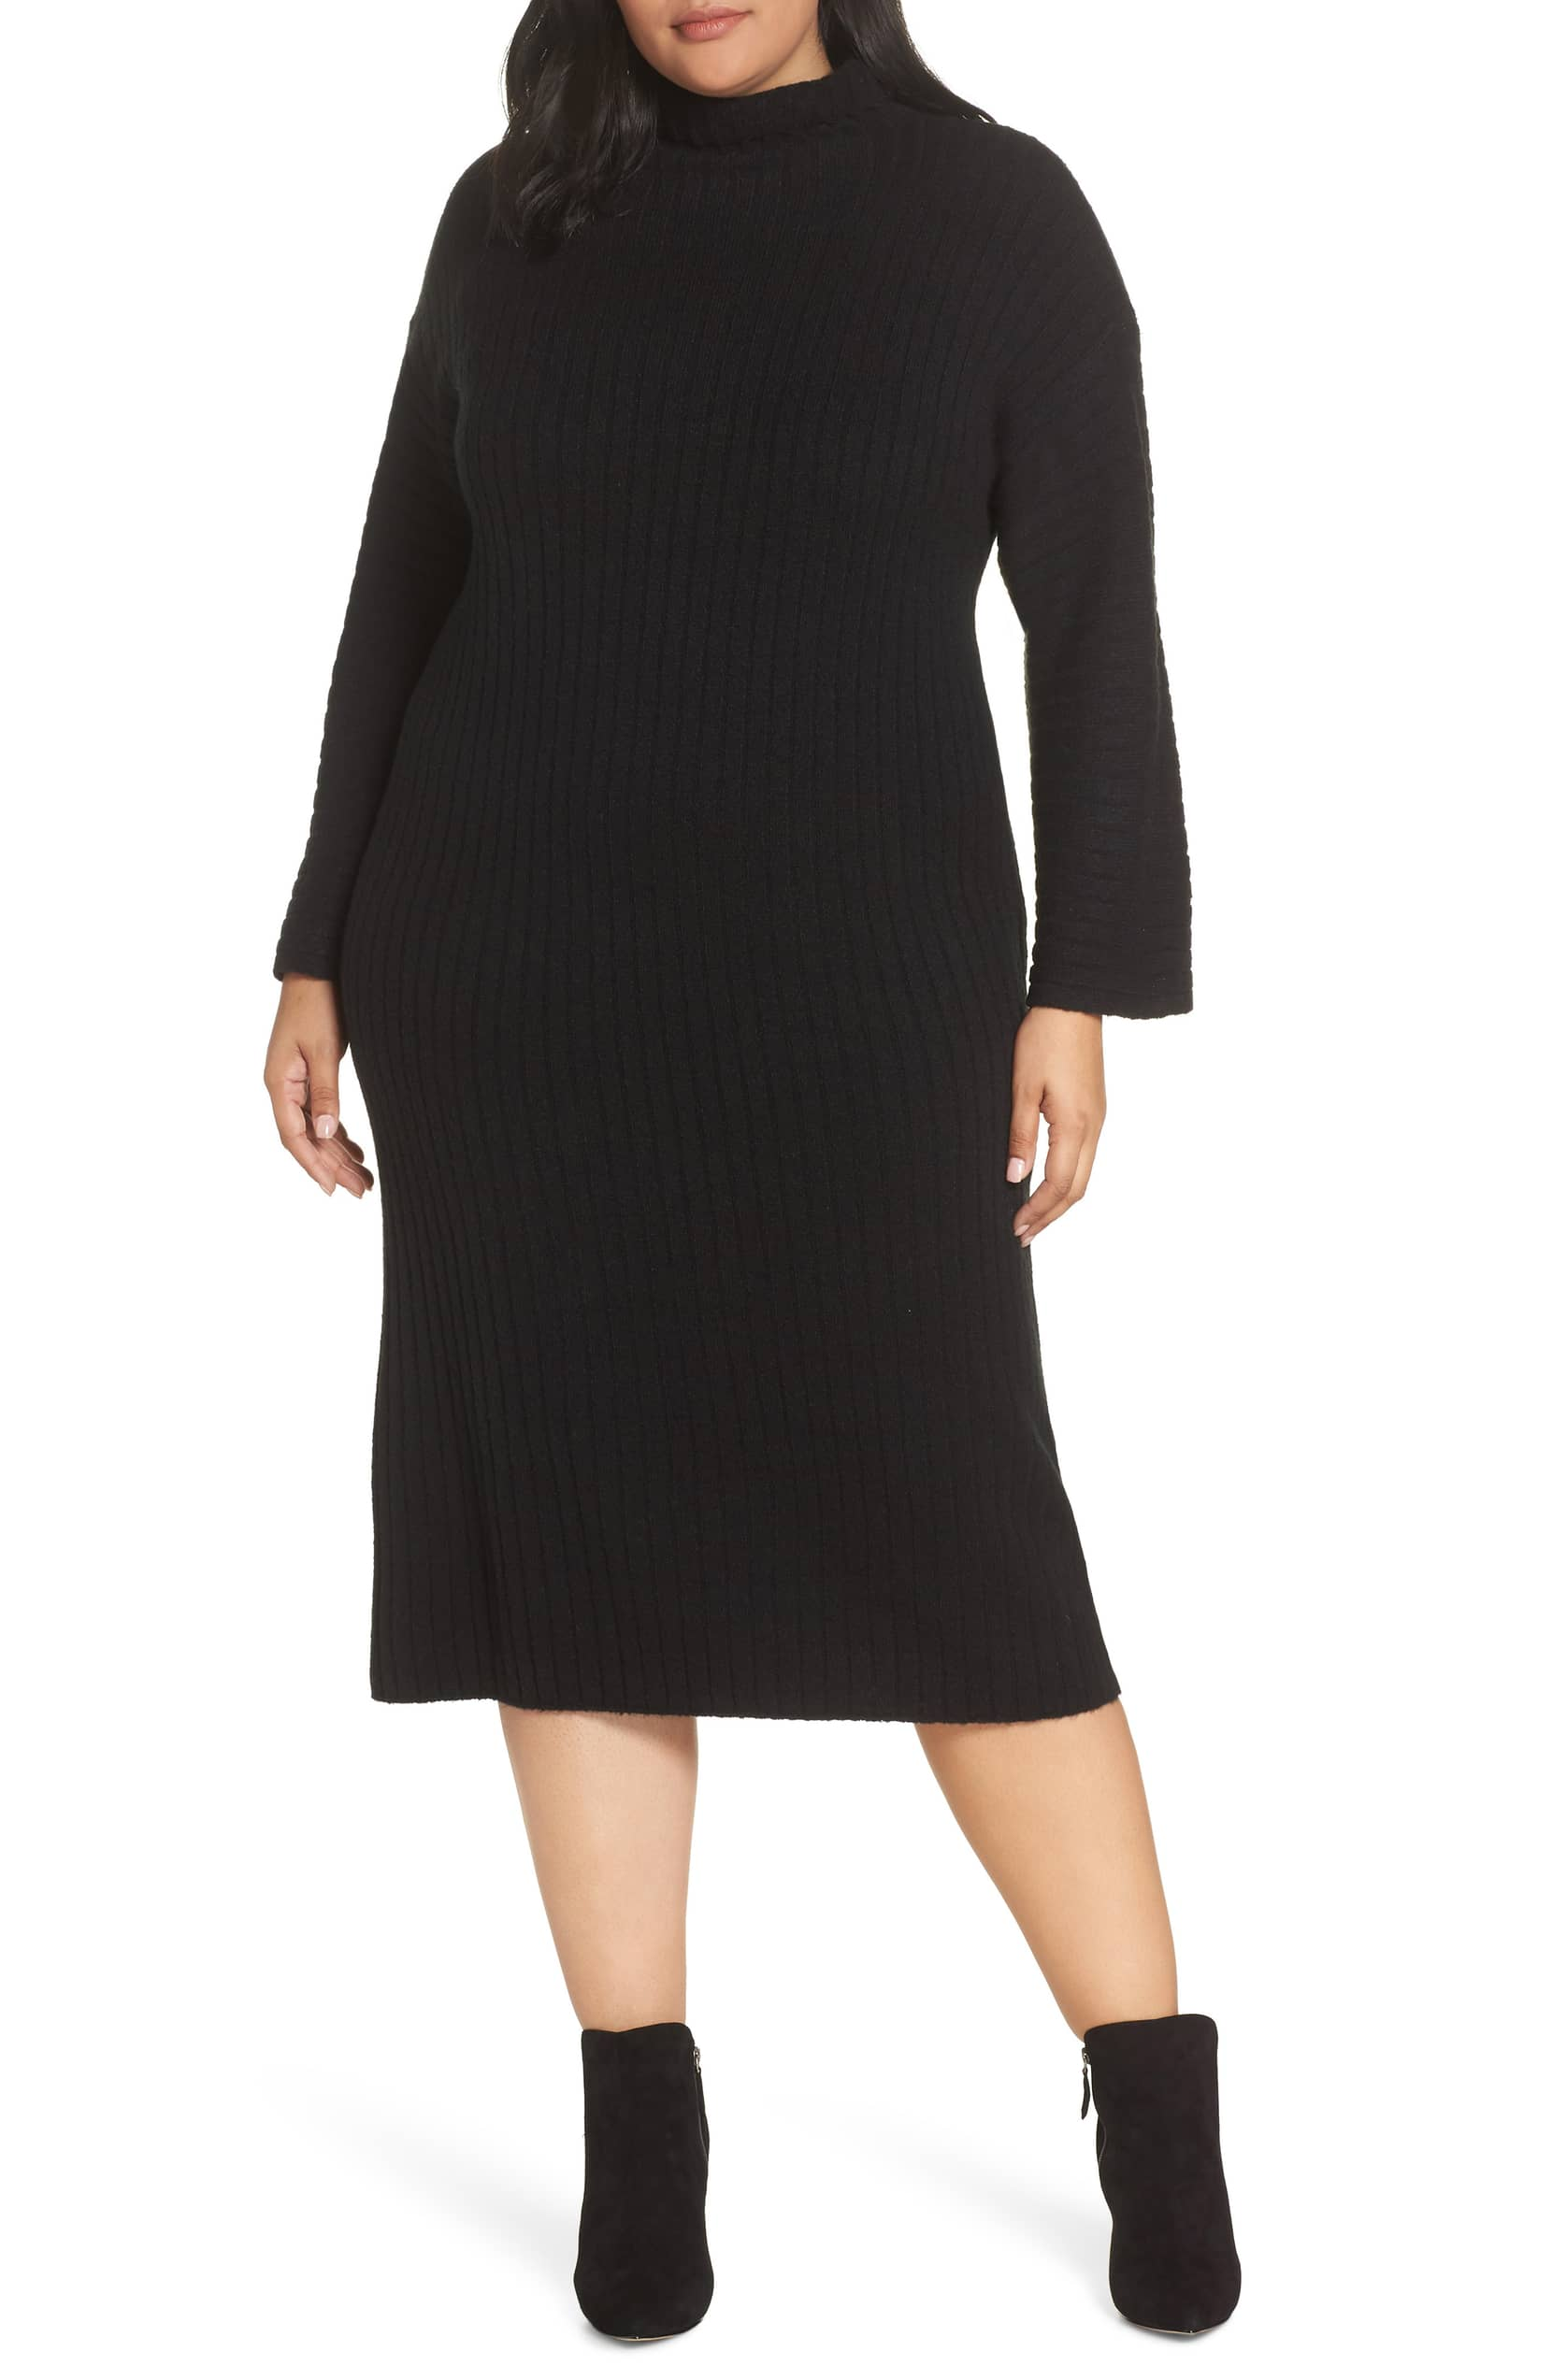 0119245b2 Leith + Plus Size Ribbed Midi Sweater Dress